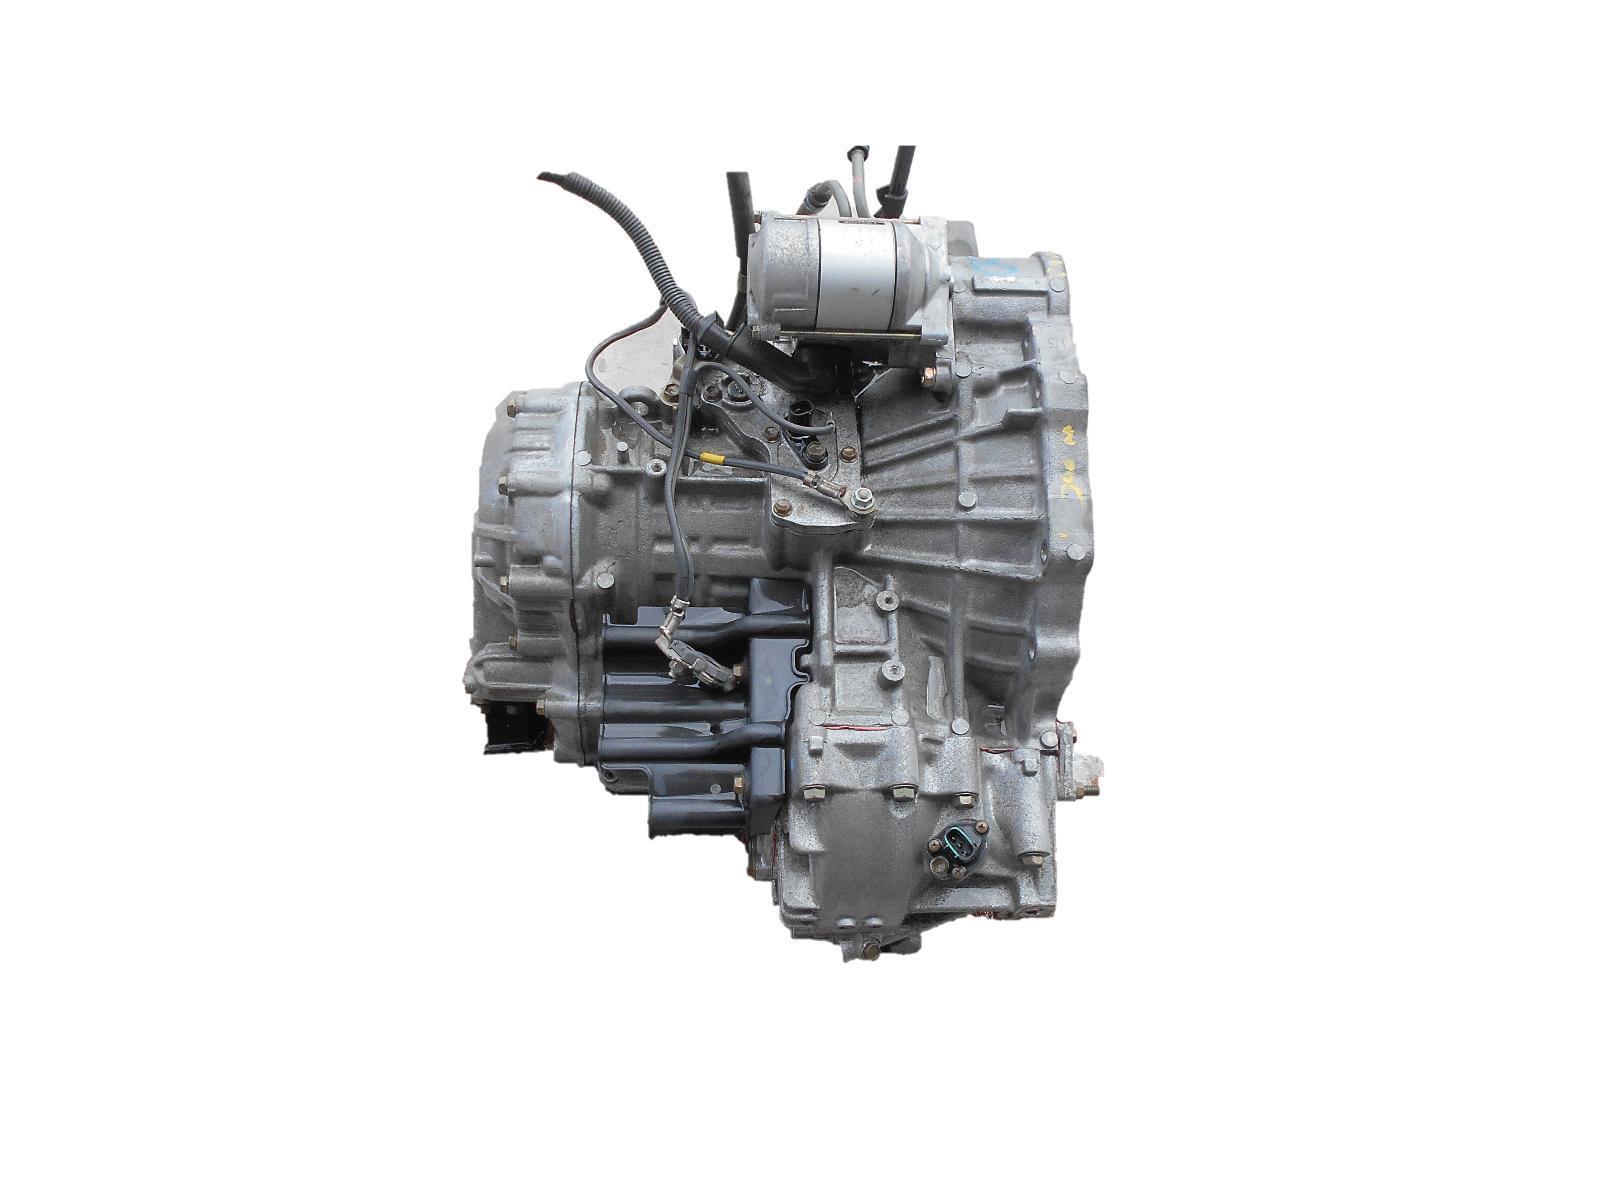 LEXUS ES300 (92-05), Trans/Gearbox, AUTO, 3.0, 1MZ, MCV20, 10/96-10/01